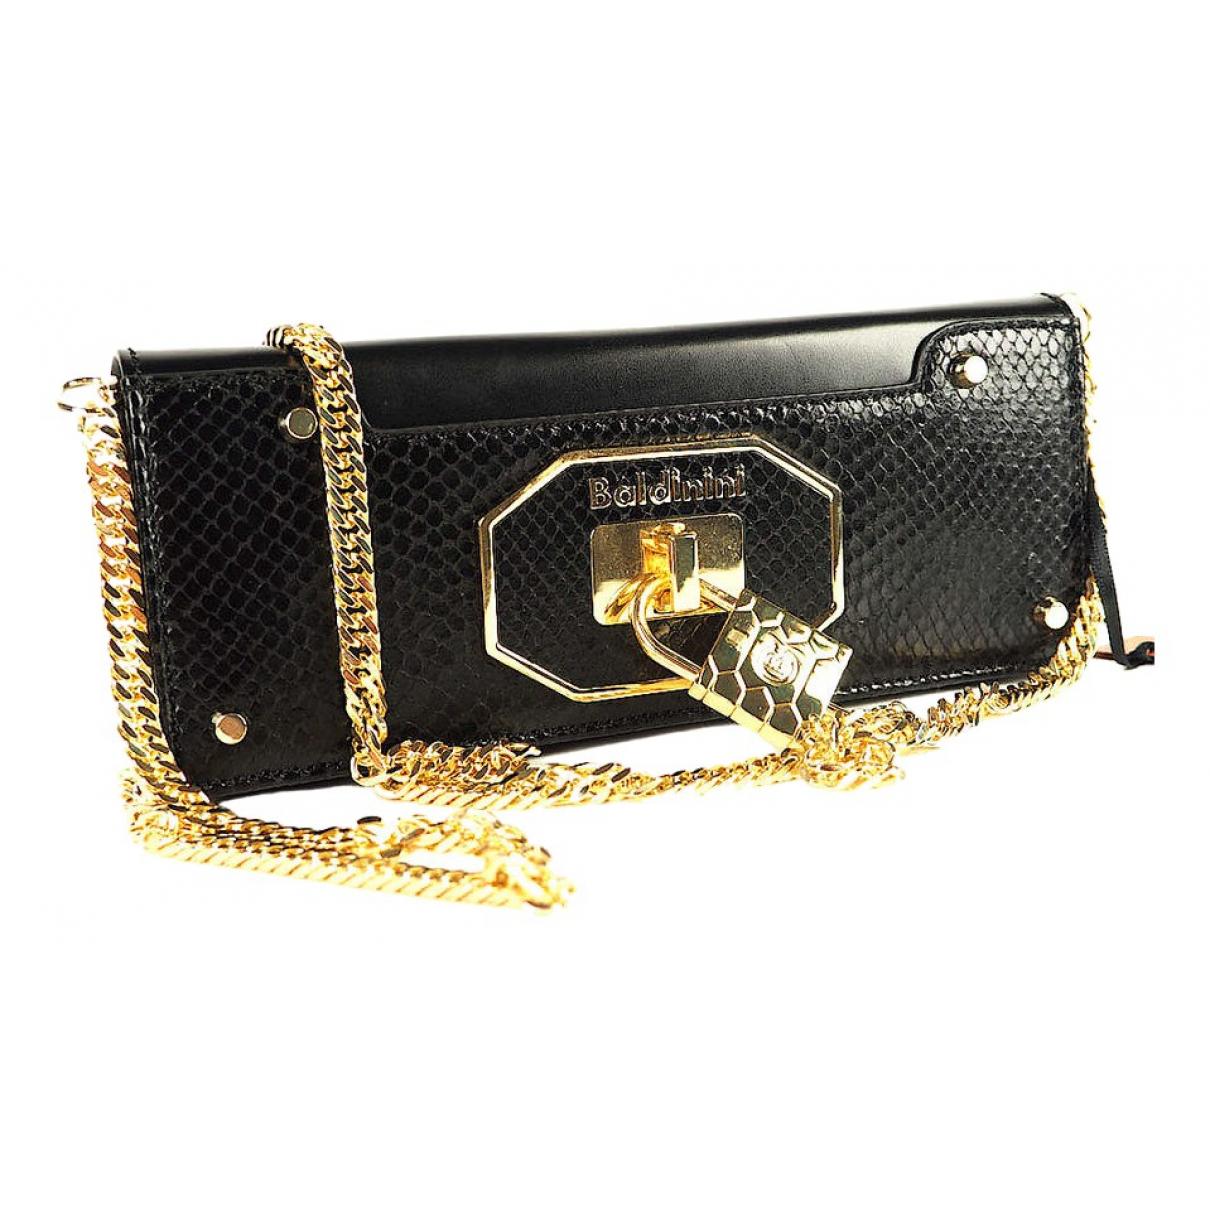 Baldinini \N Handtasche in  Schwarz Leder